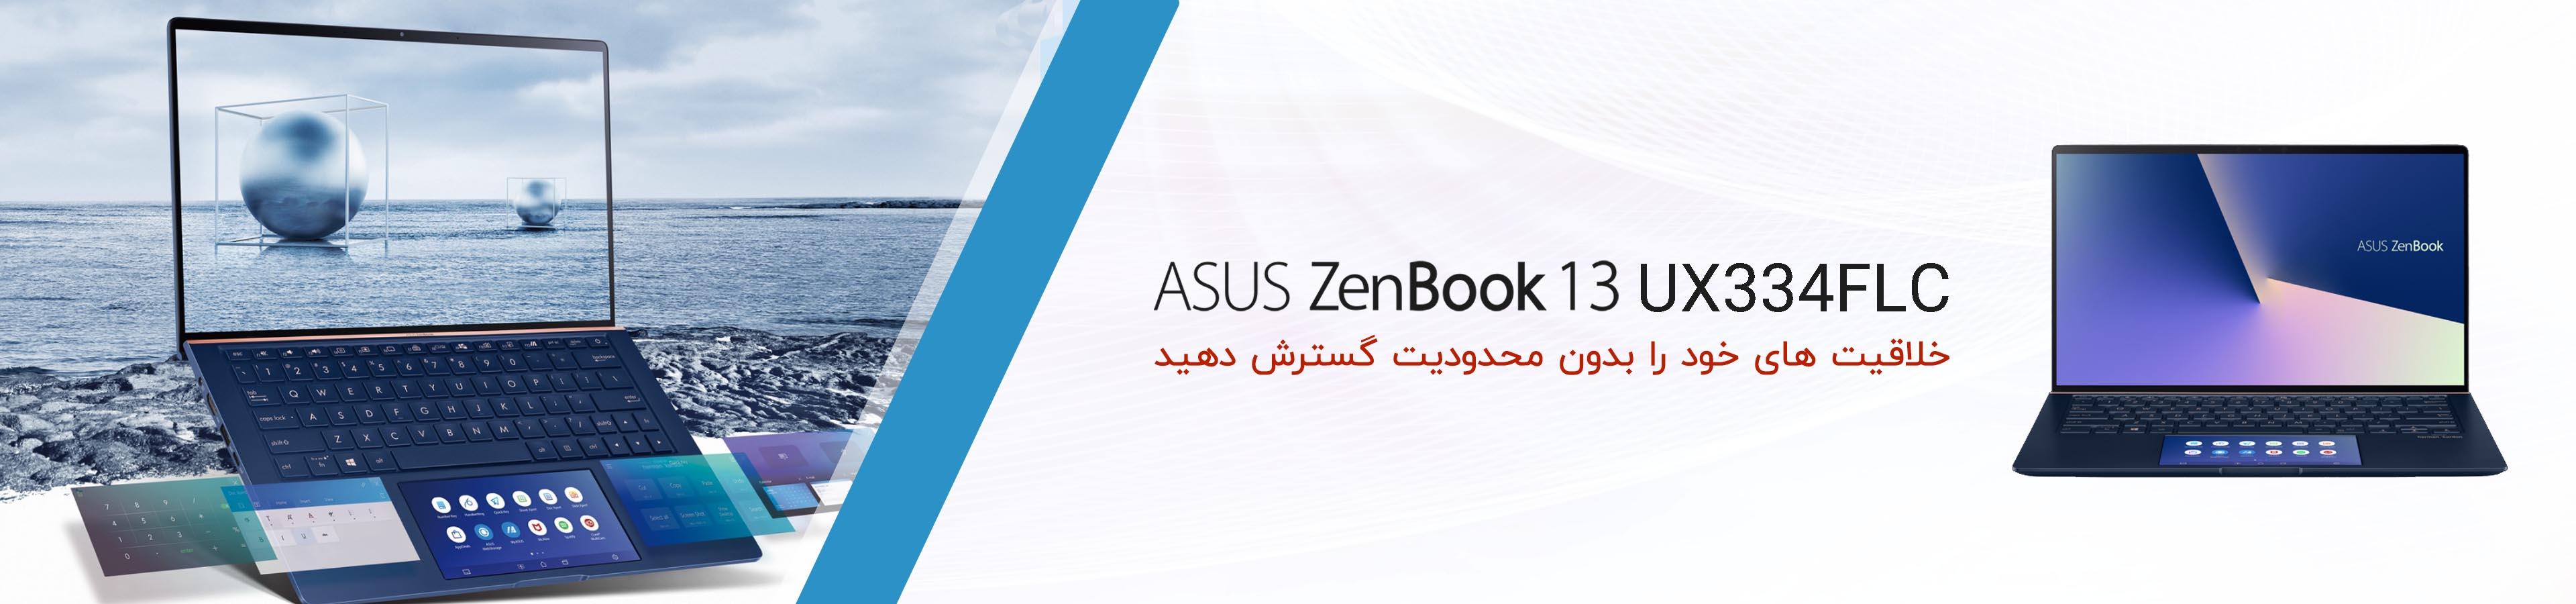 ASUS-ZenBook-UX334FLC